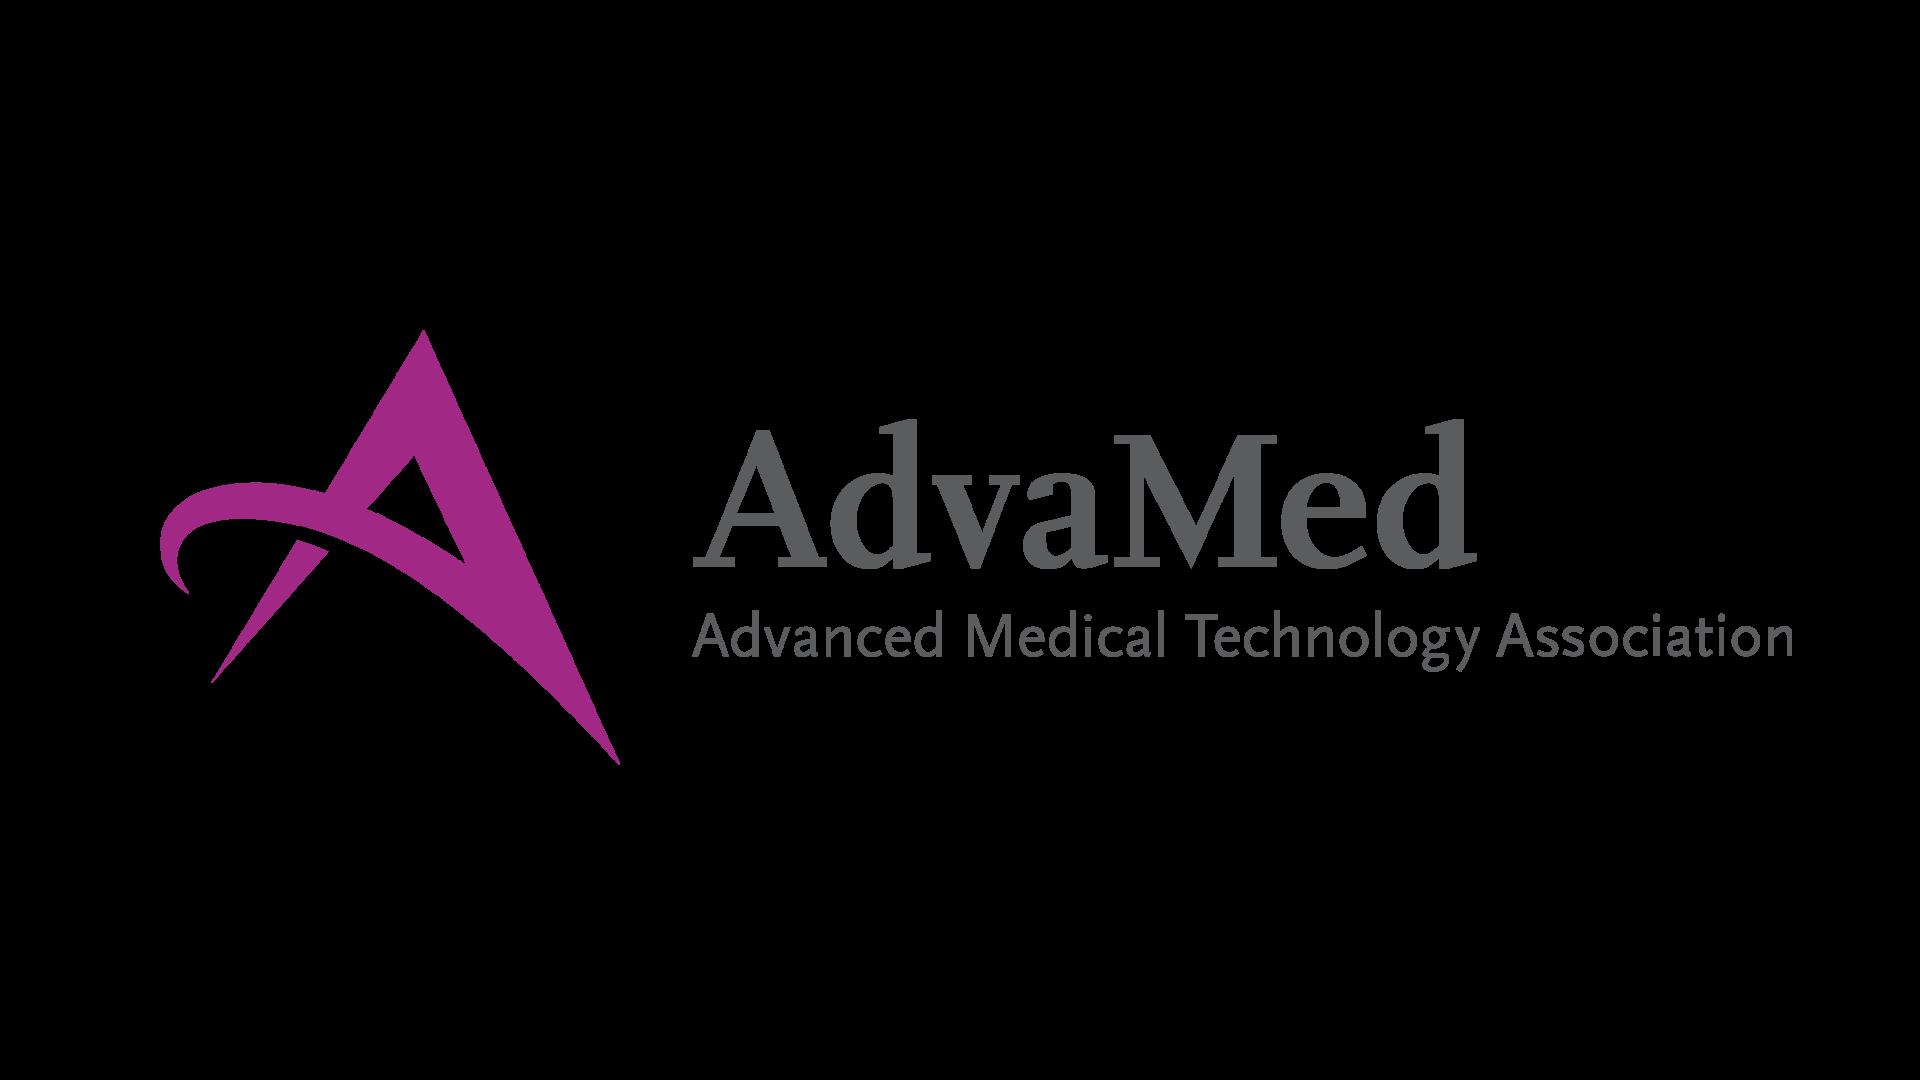 Logotipo AdvaMed